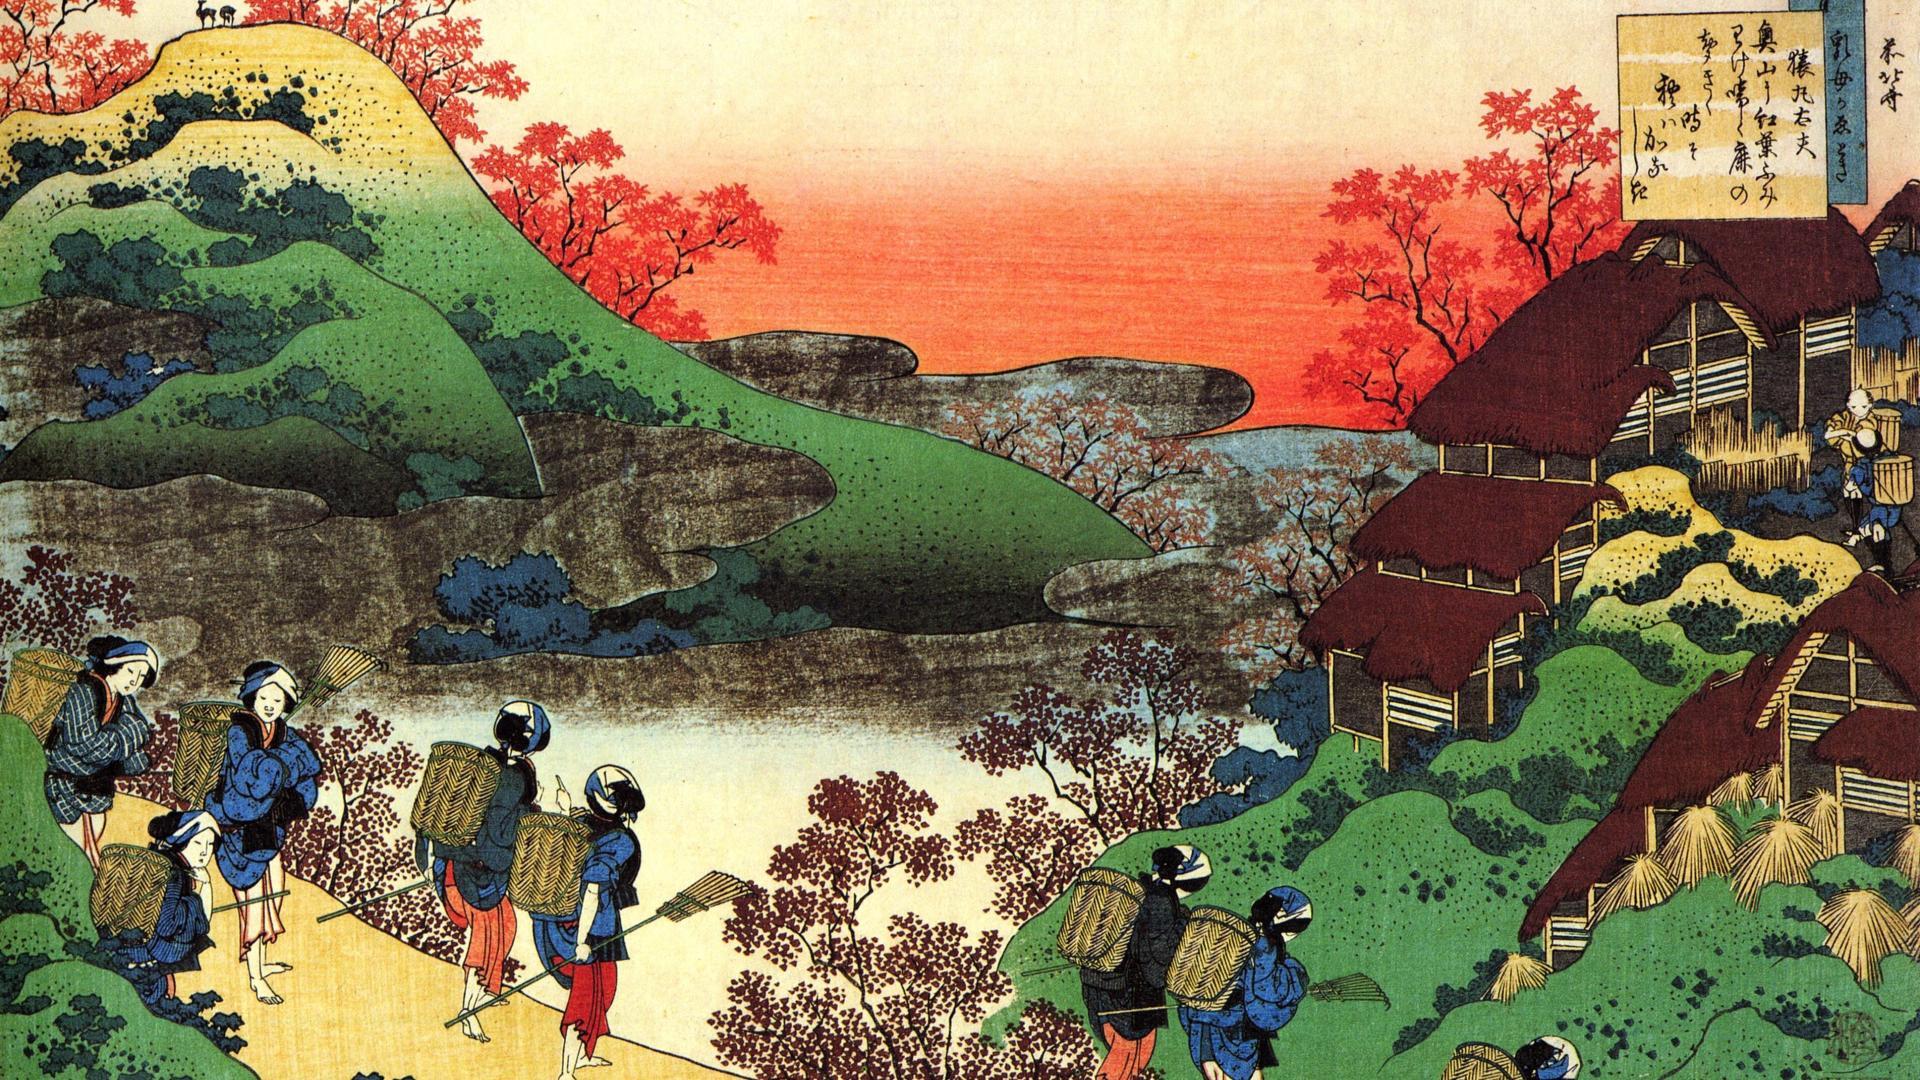 Japanese artwork katsushika hokusai wallpaper 1920x1080